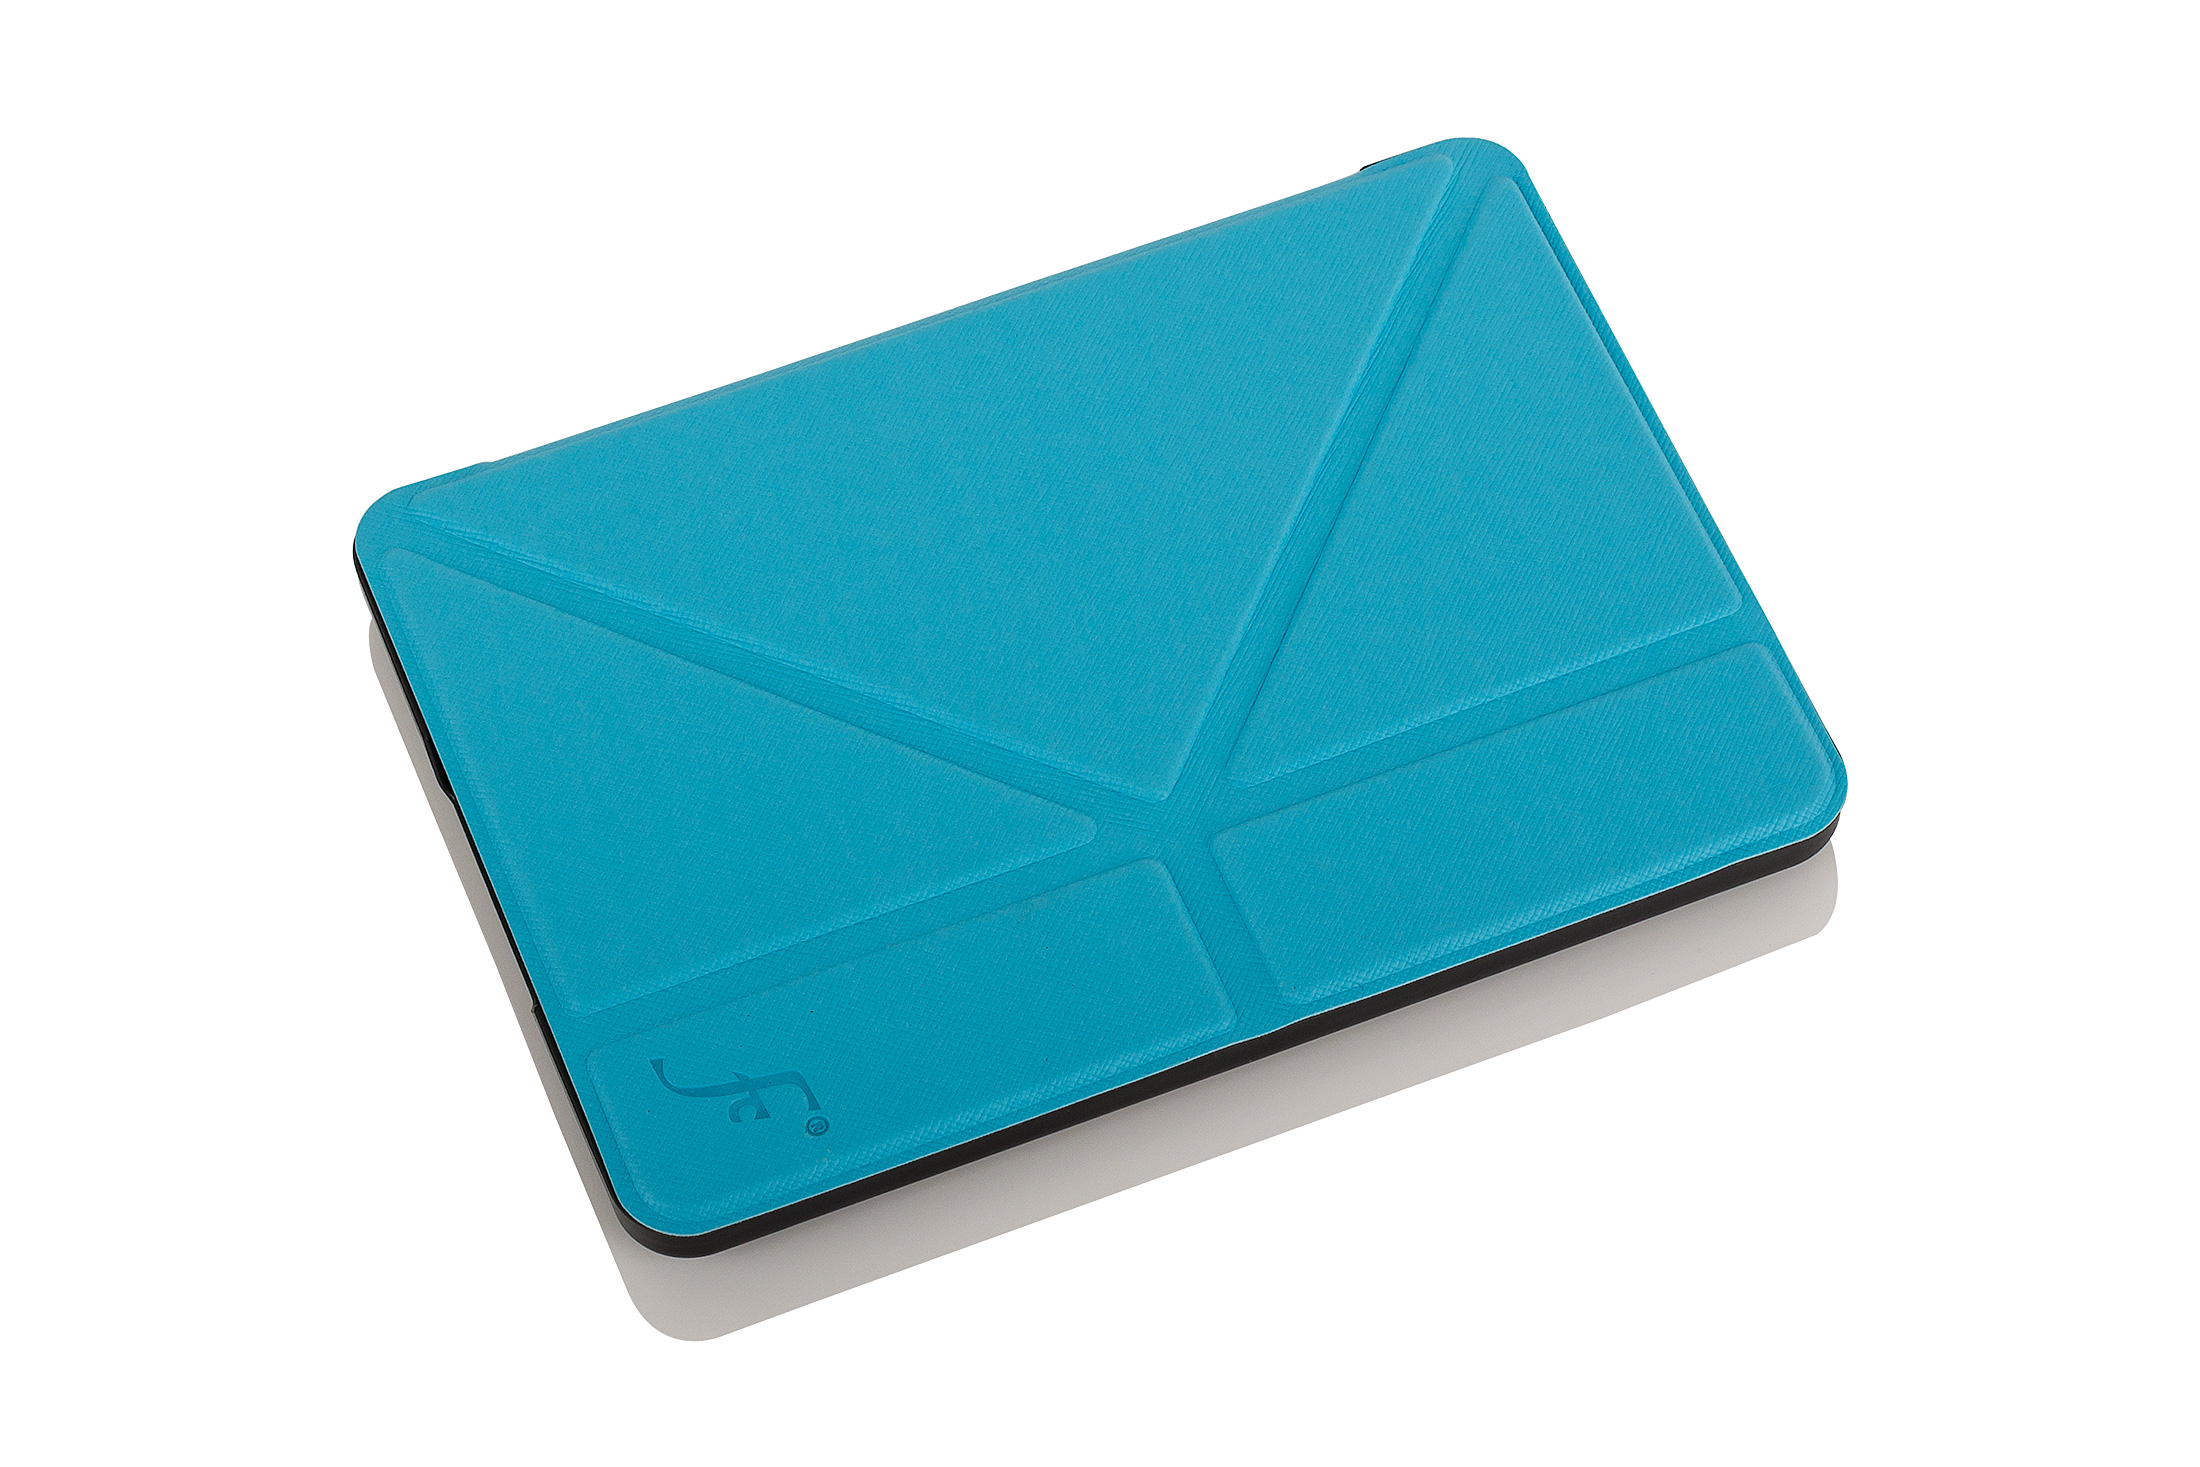 Amazon Kindle Origami Cover